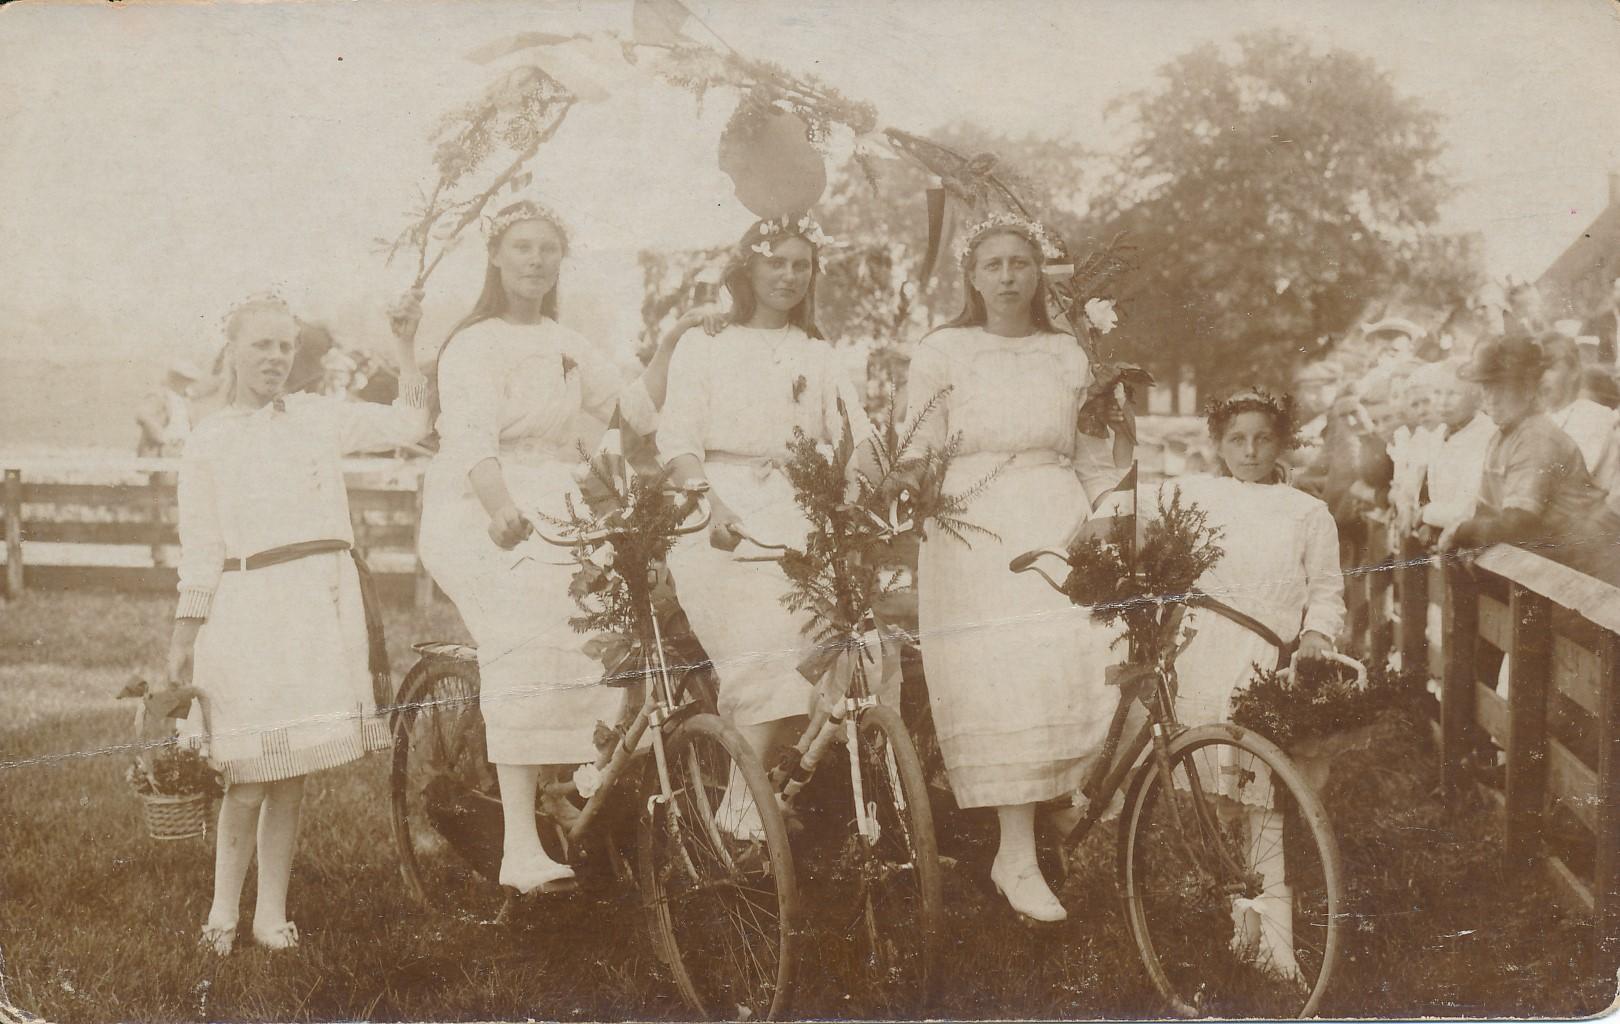 Fotoalbum Eddie Groen, 006, froulju unbekind, ca. 1917-1918